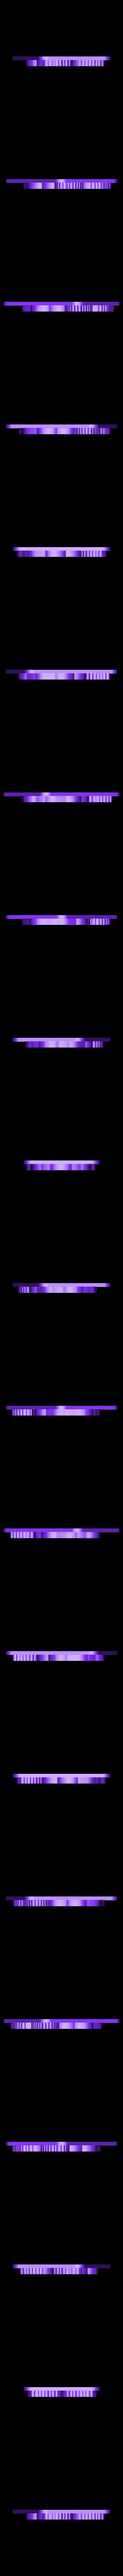 TAZ_5_Raspberry_Pi_3_Mount_-_Pi_Logo_Gray.stl Download free STL file TAZ 5 Raspberry Pi 2 / 3 Main Box Extension • 3D print template, crprinting